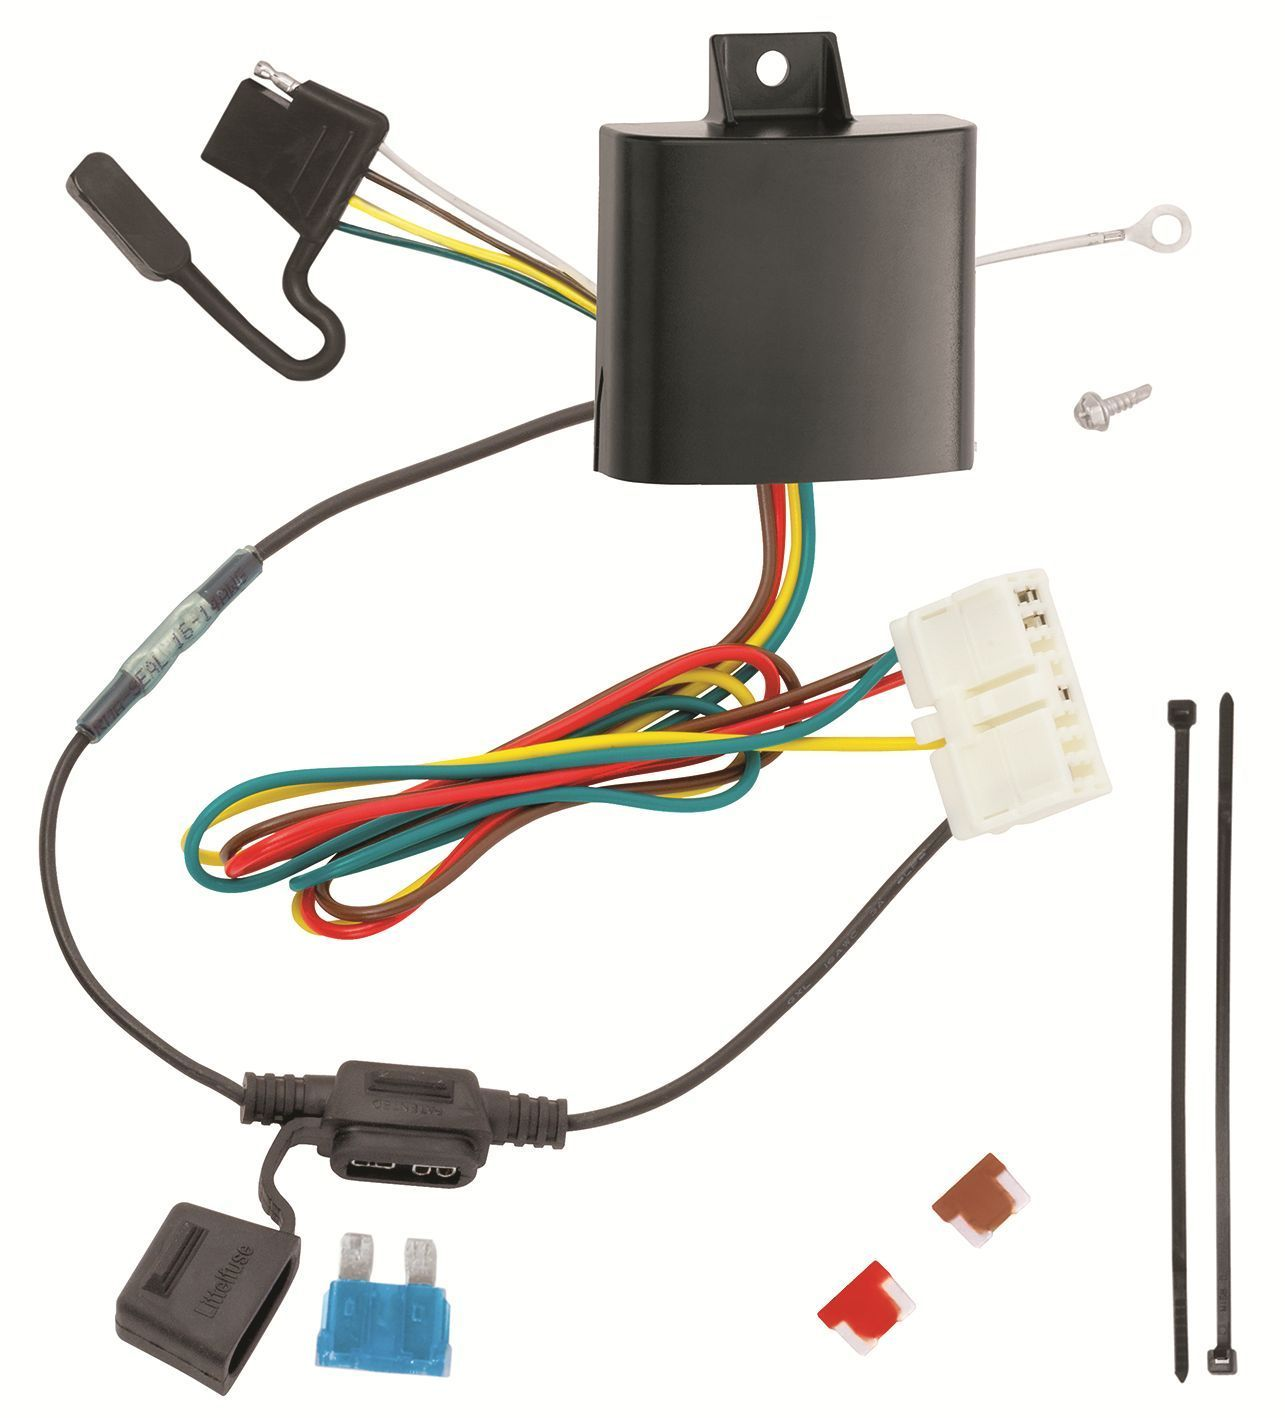 2510 Wiring Harness Auto Electrical Diagram Nissan Titan Trailer Acura 2011 Rdx Armada